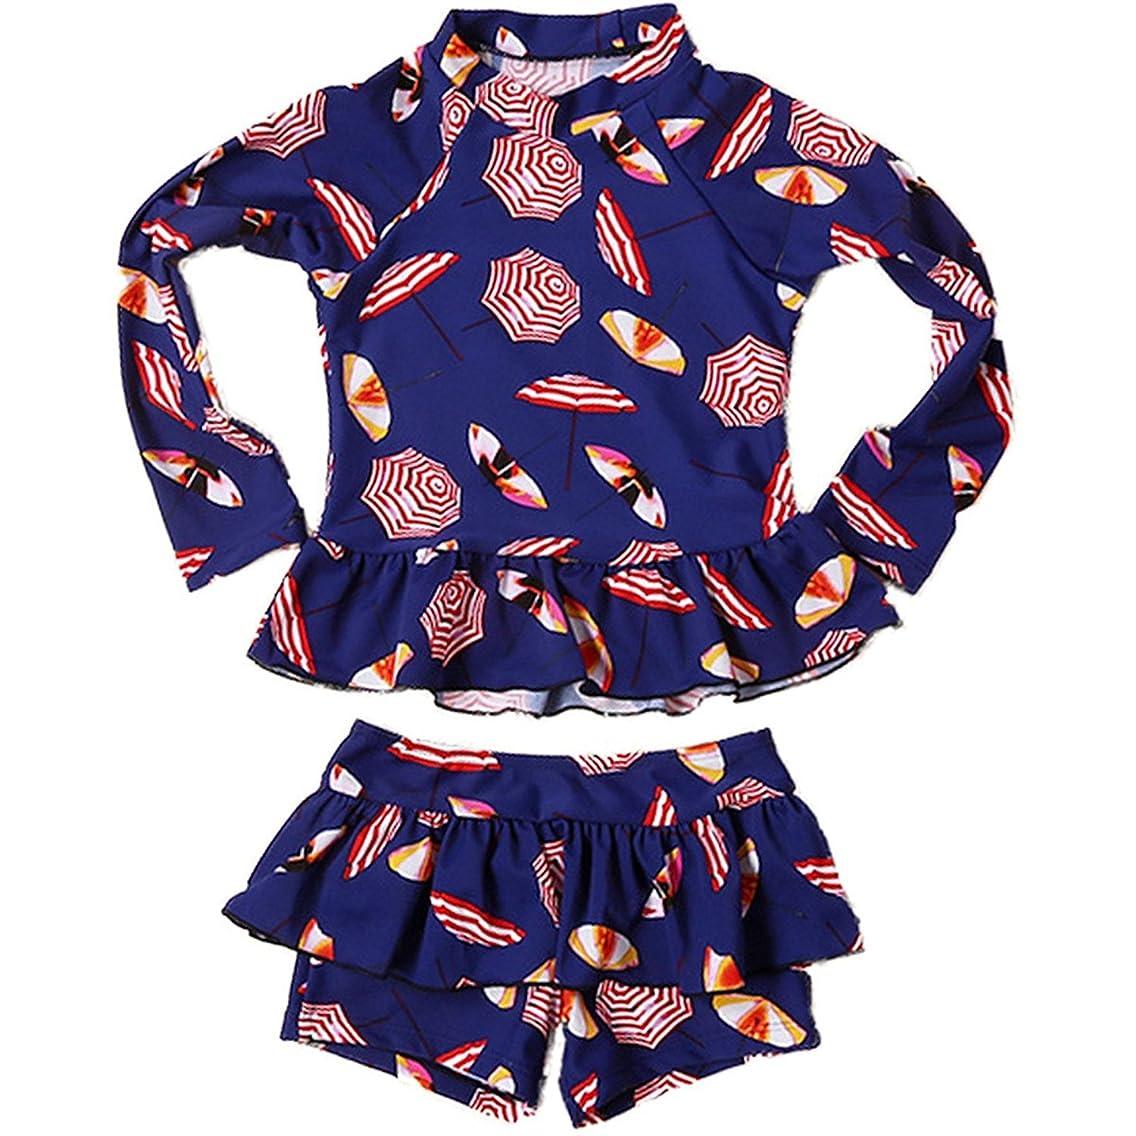 Baby Kids Girls 2pcs Long Sleeve Sun Protection Umbrella Print Rash Guard Beach Swimwear Swimsuit UPF 50+ UV